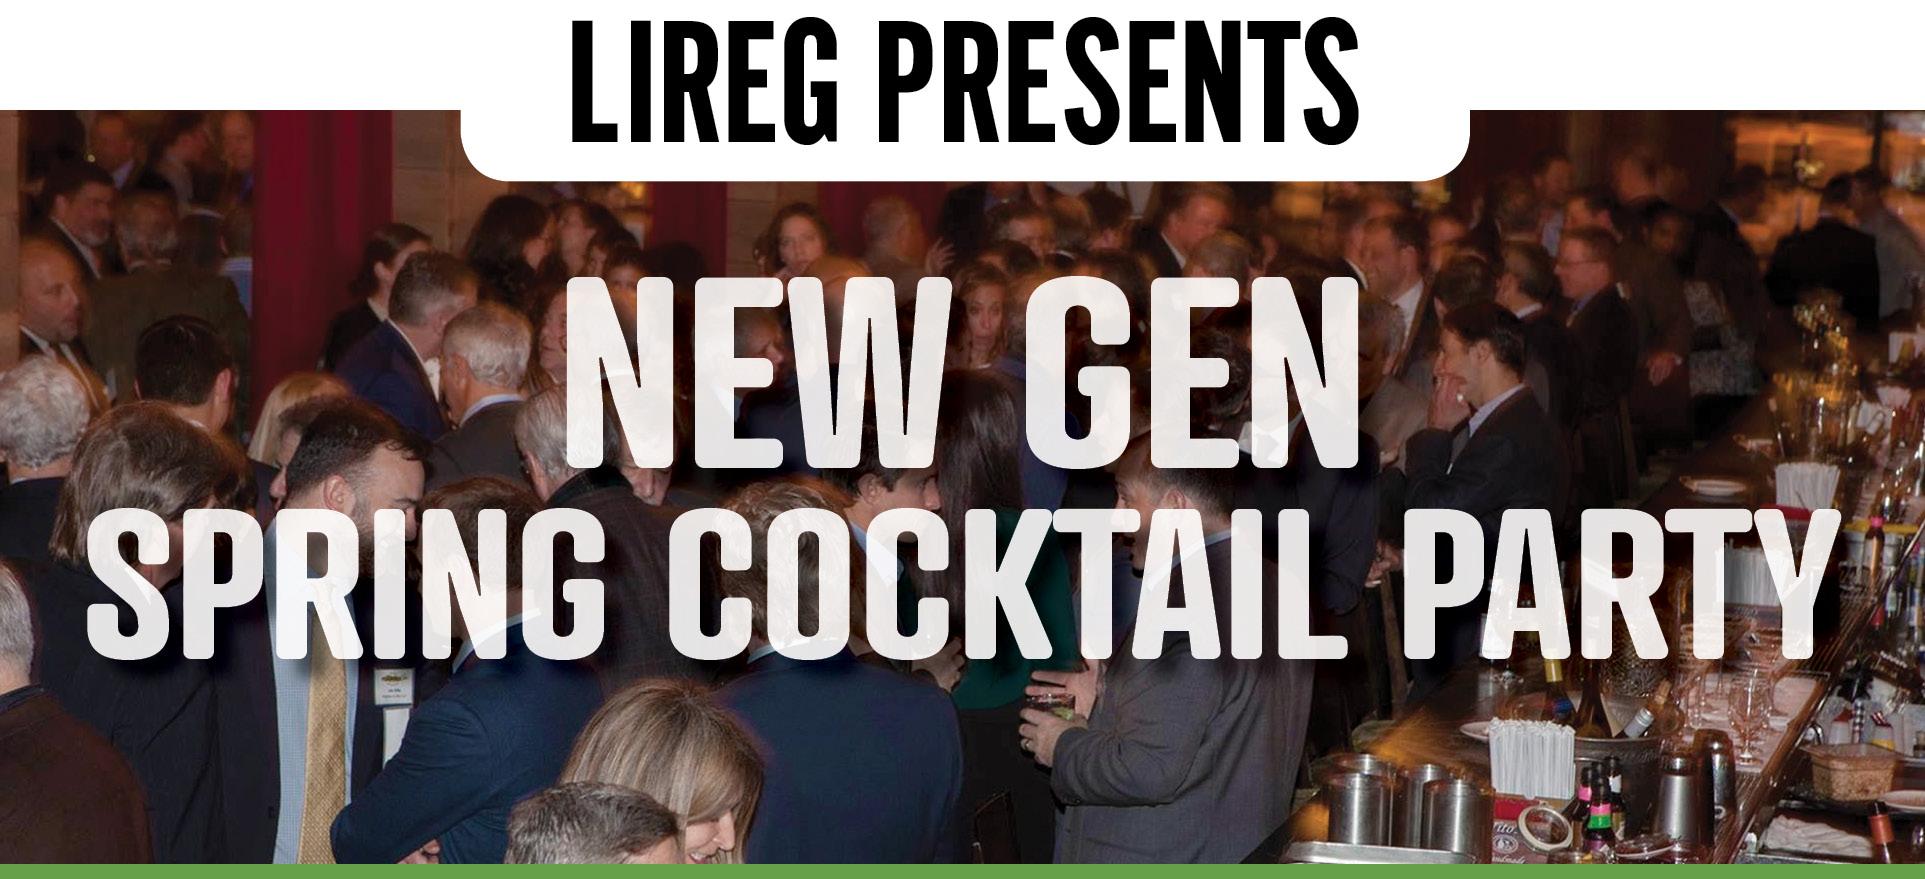 New Gen Spring Cocktail Party Lireg